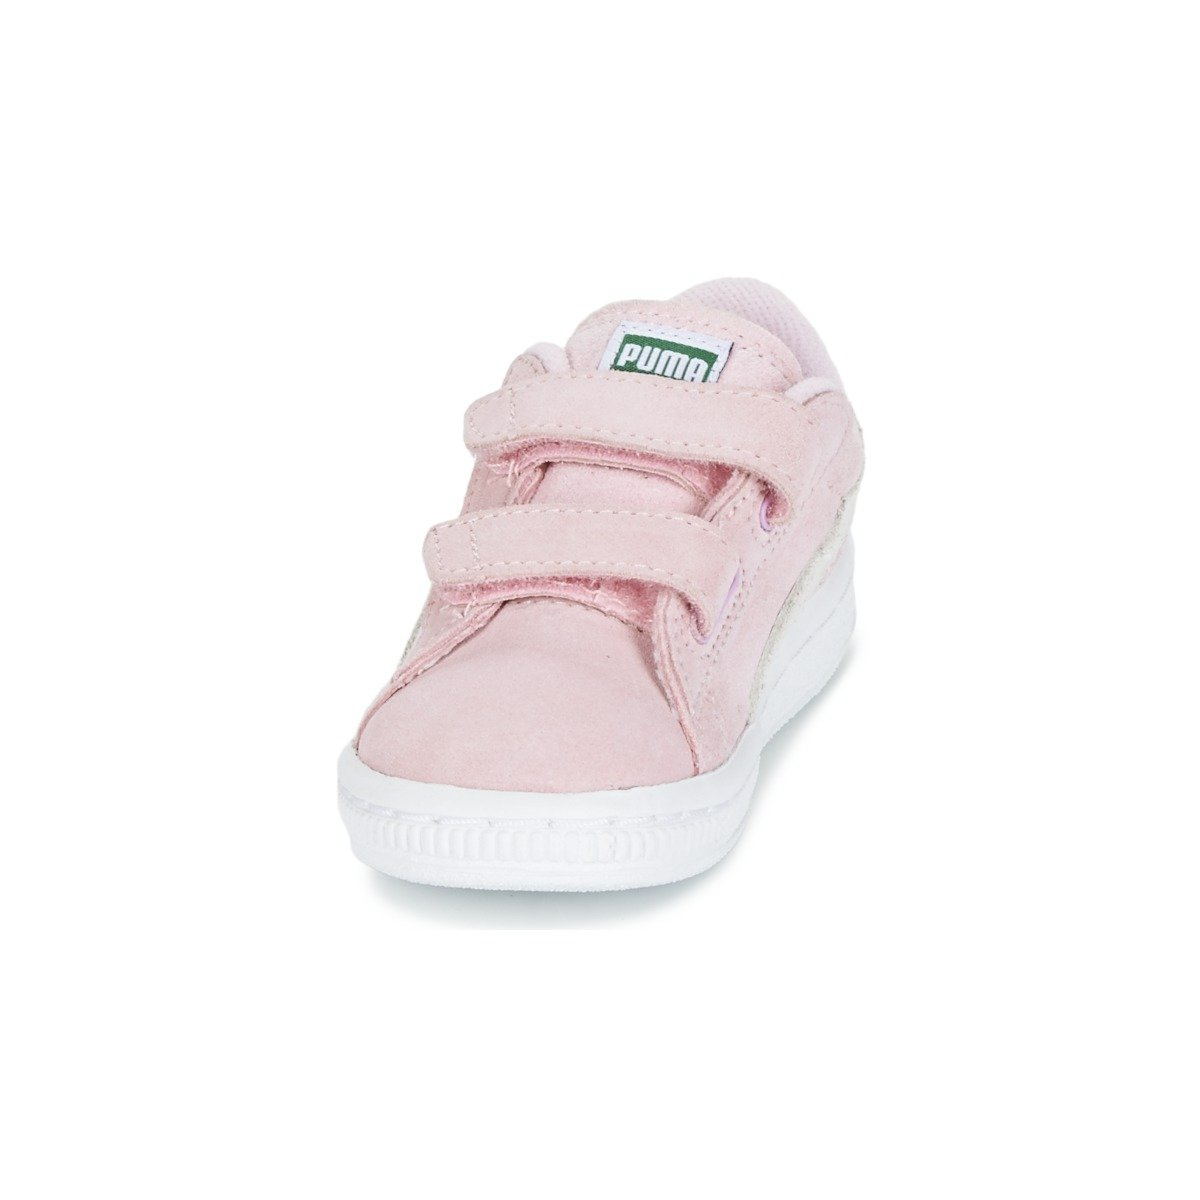 Puma Unisex Suede 2 Straps Inf Walking Baby Trainers